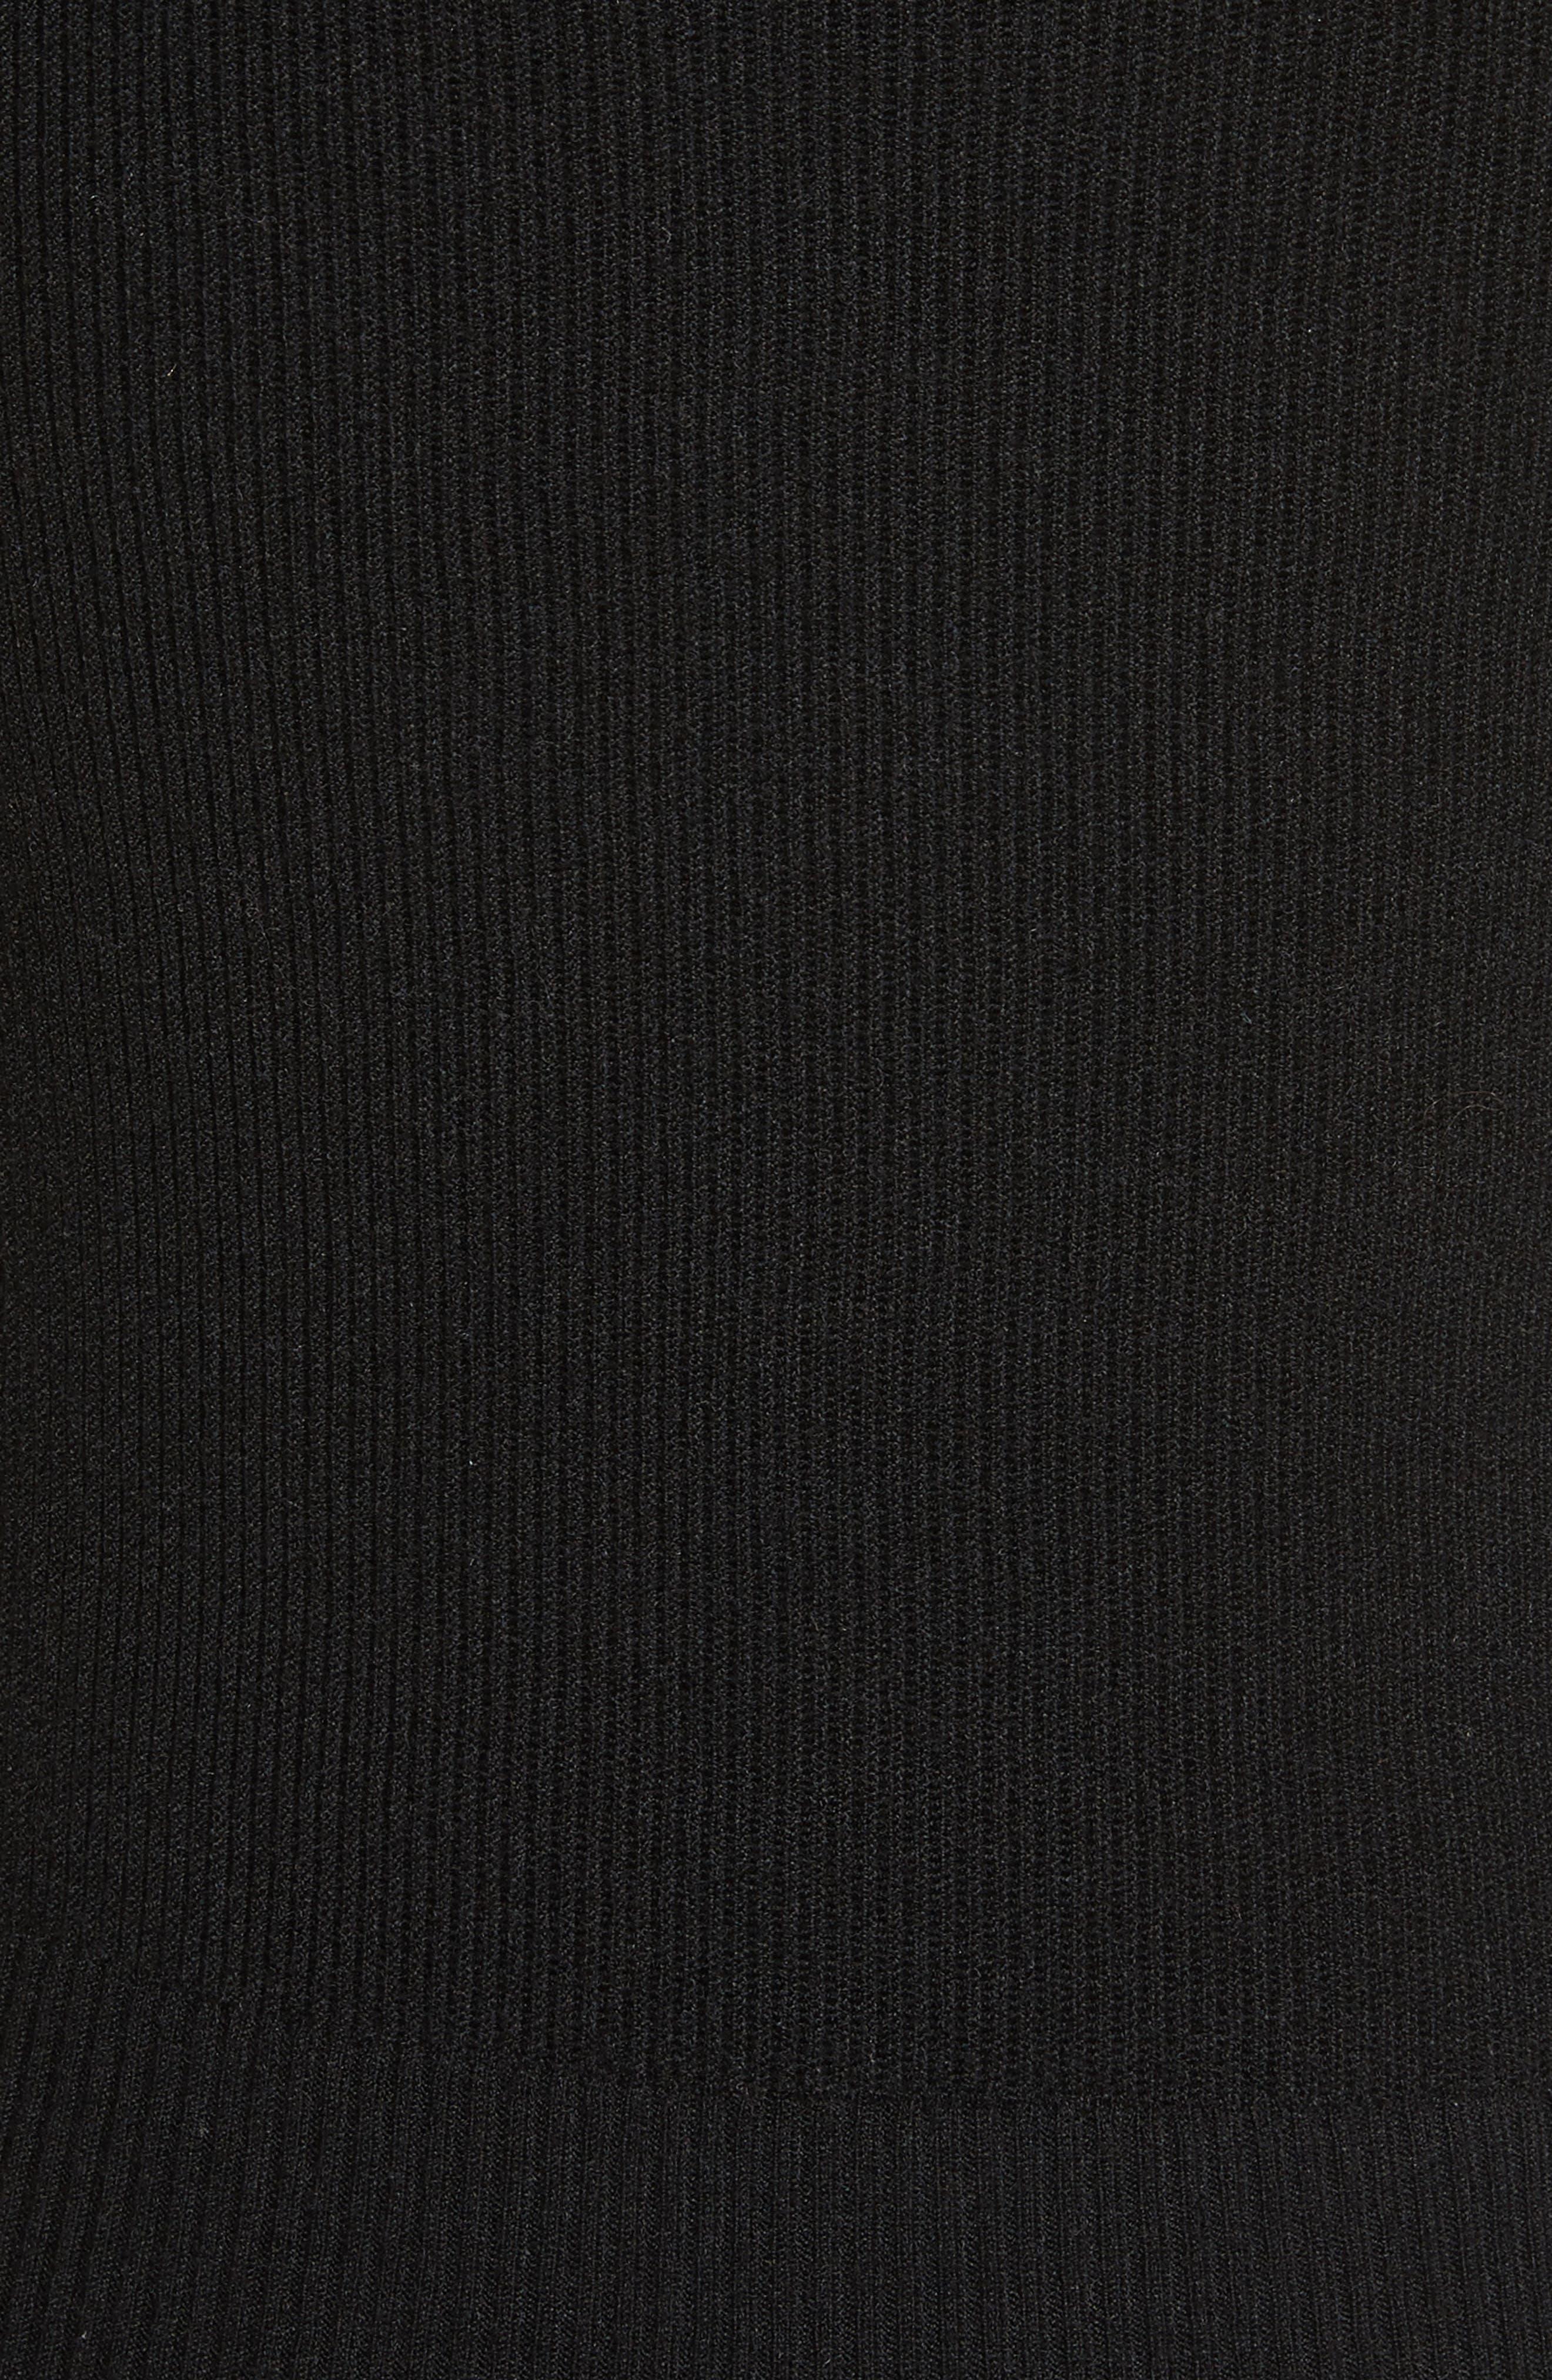 Décolletage Sweater,                             Alternate thumbnail 5, color,